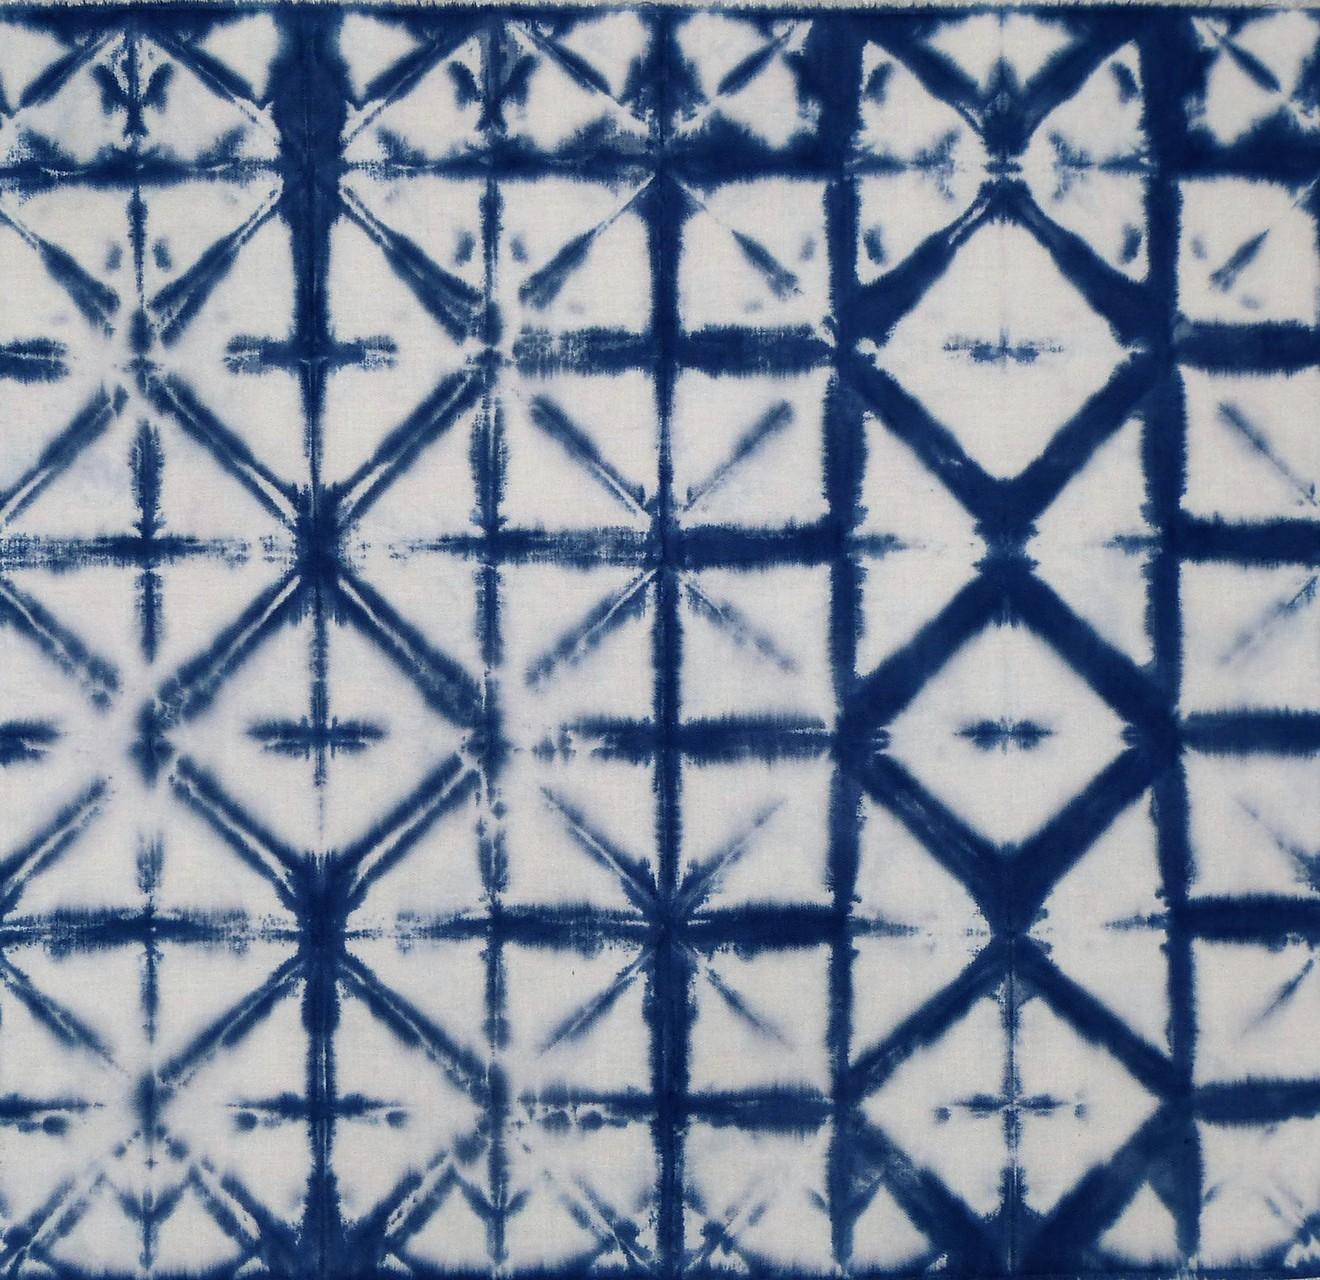 shibori - quilt-arounds webseite!